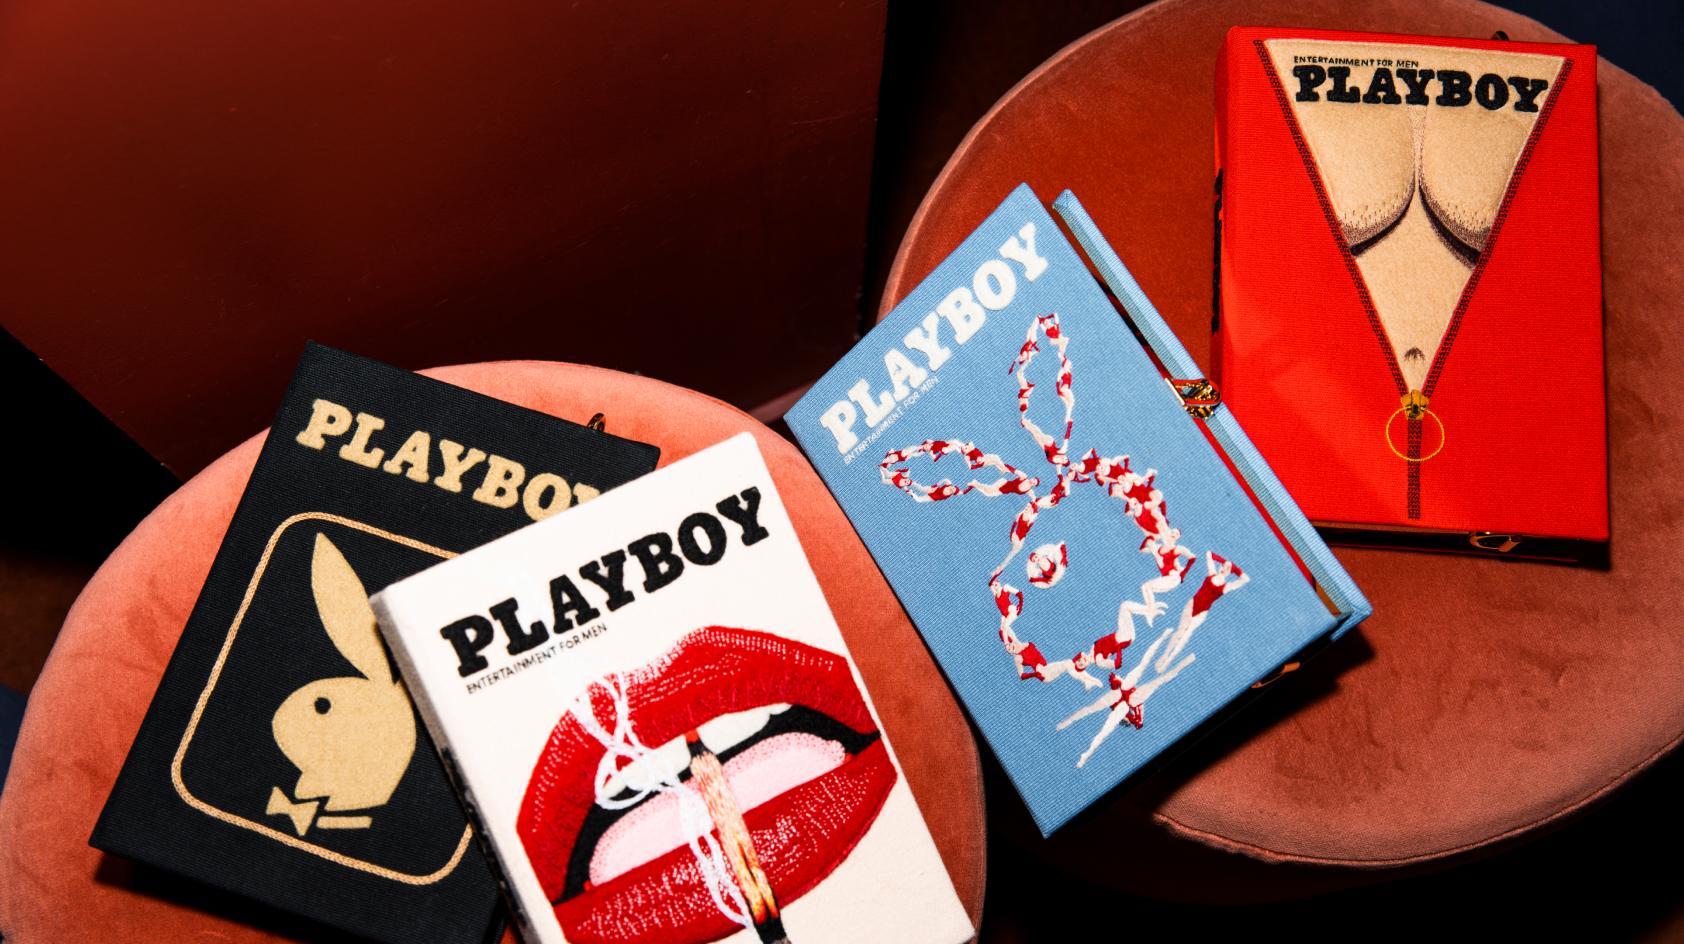 Password playboy login Join PlayboyPlus